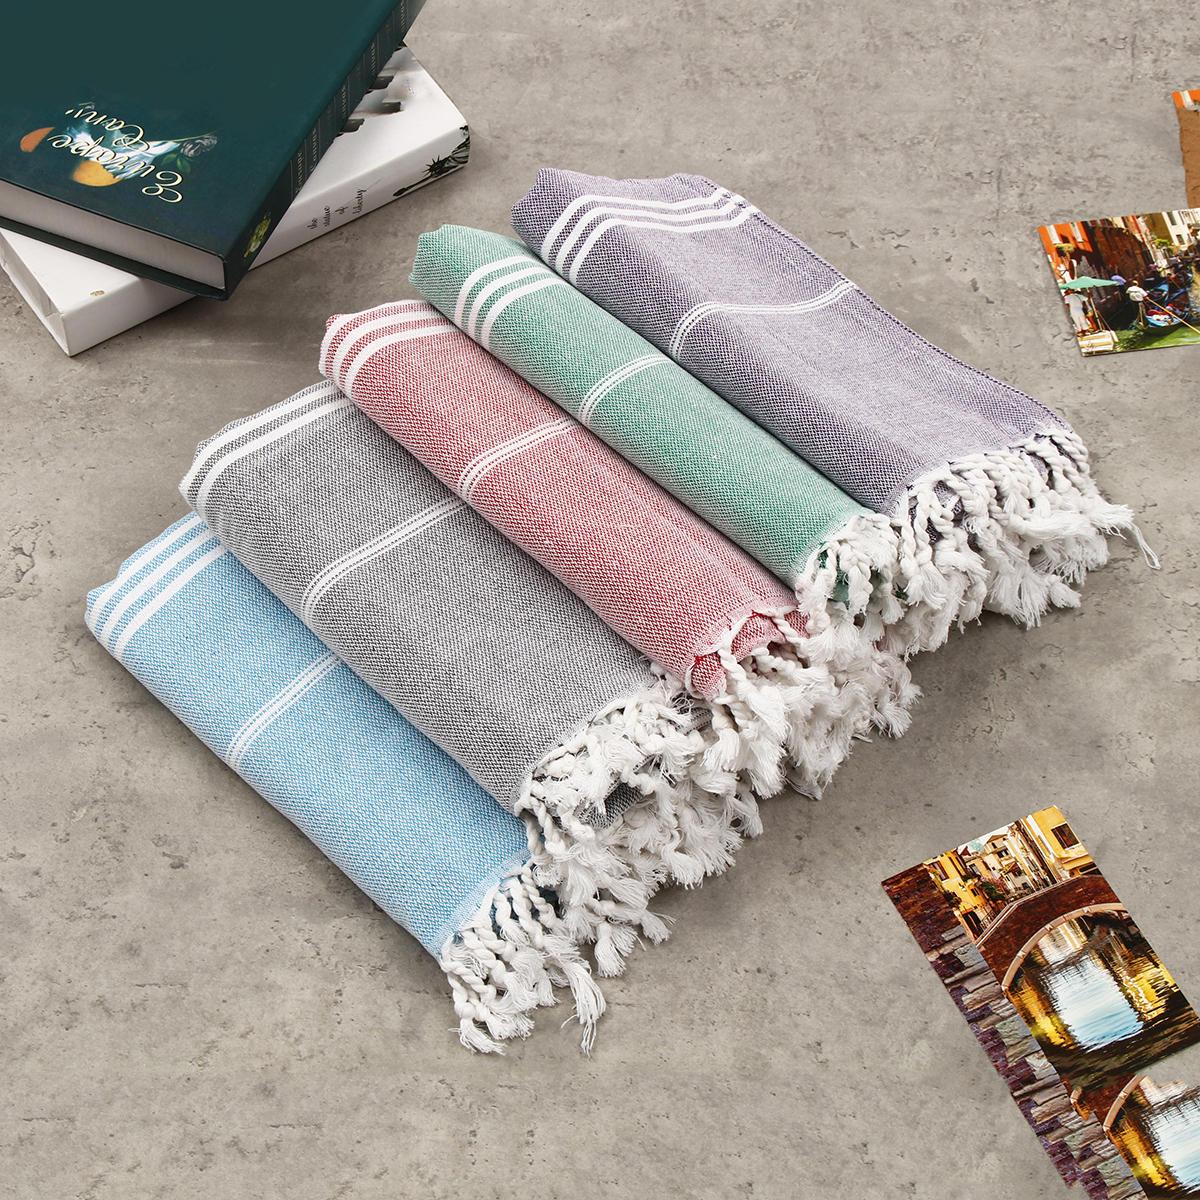 Sport Towel Peshtemal,100/% Cotton Turkish Bath Towel,Striped Beach Towel,Pool